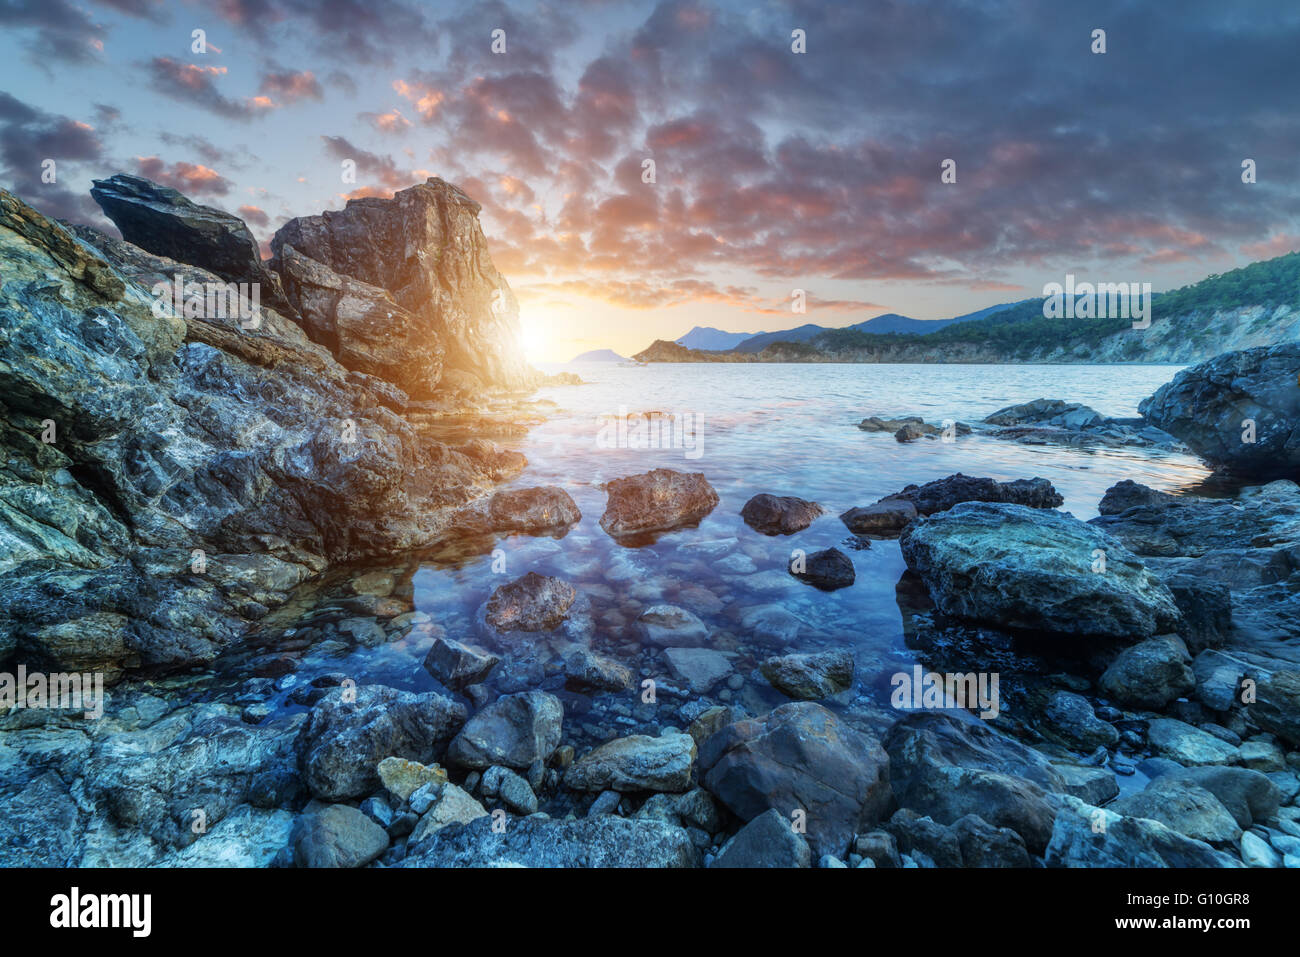 Amazing Mediterranean seascape in Turkey - Stock Image